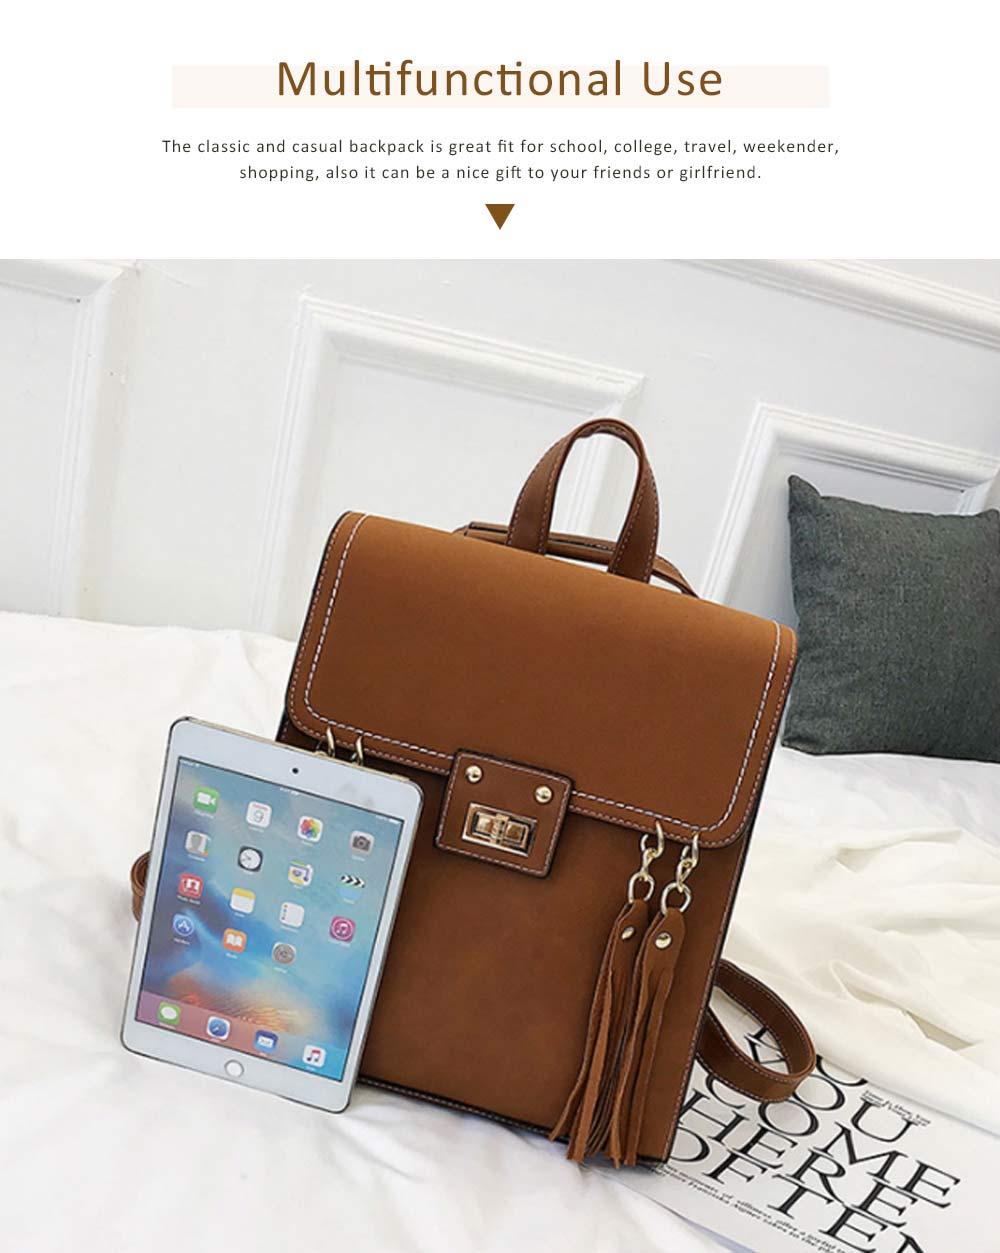 Tassels Handbags College School Bag Large Capacity Backpack Vintage Casual Flap PU Leather Shoulder Bag 4